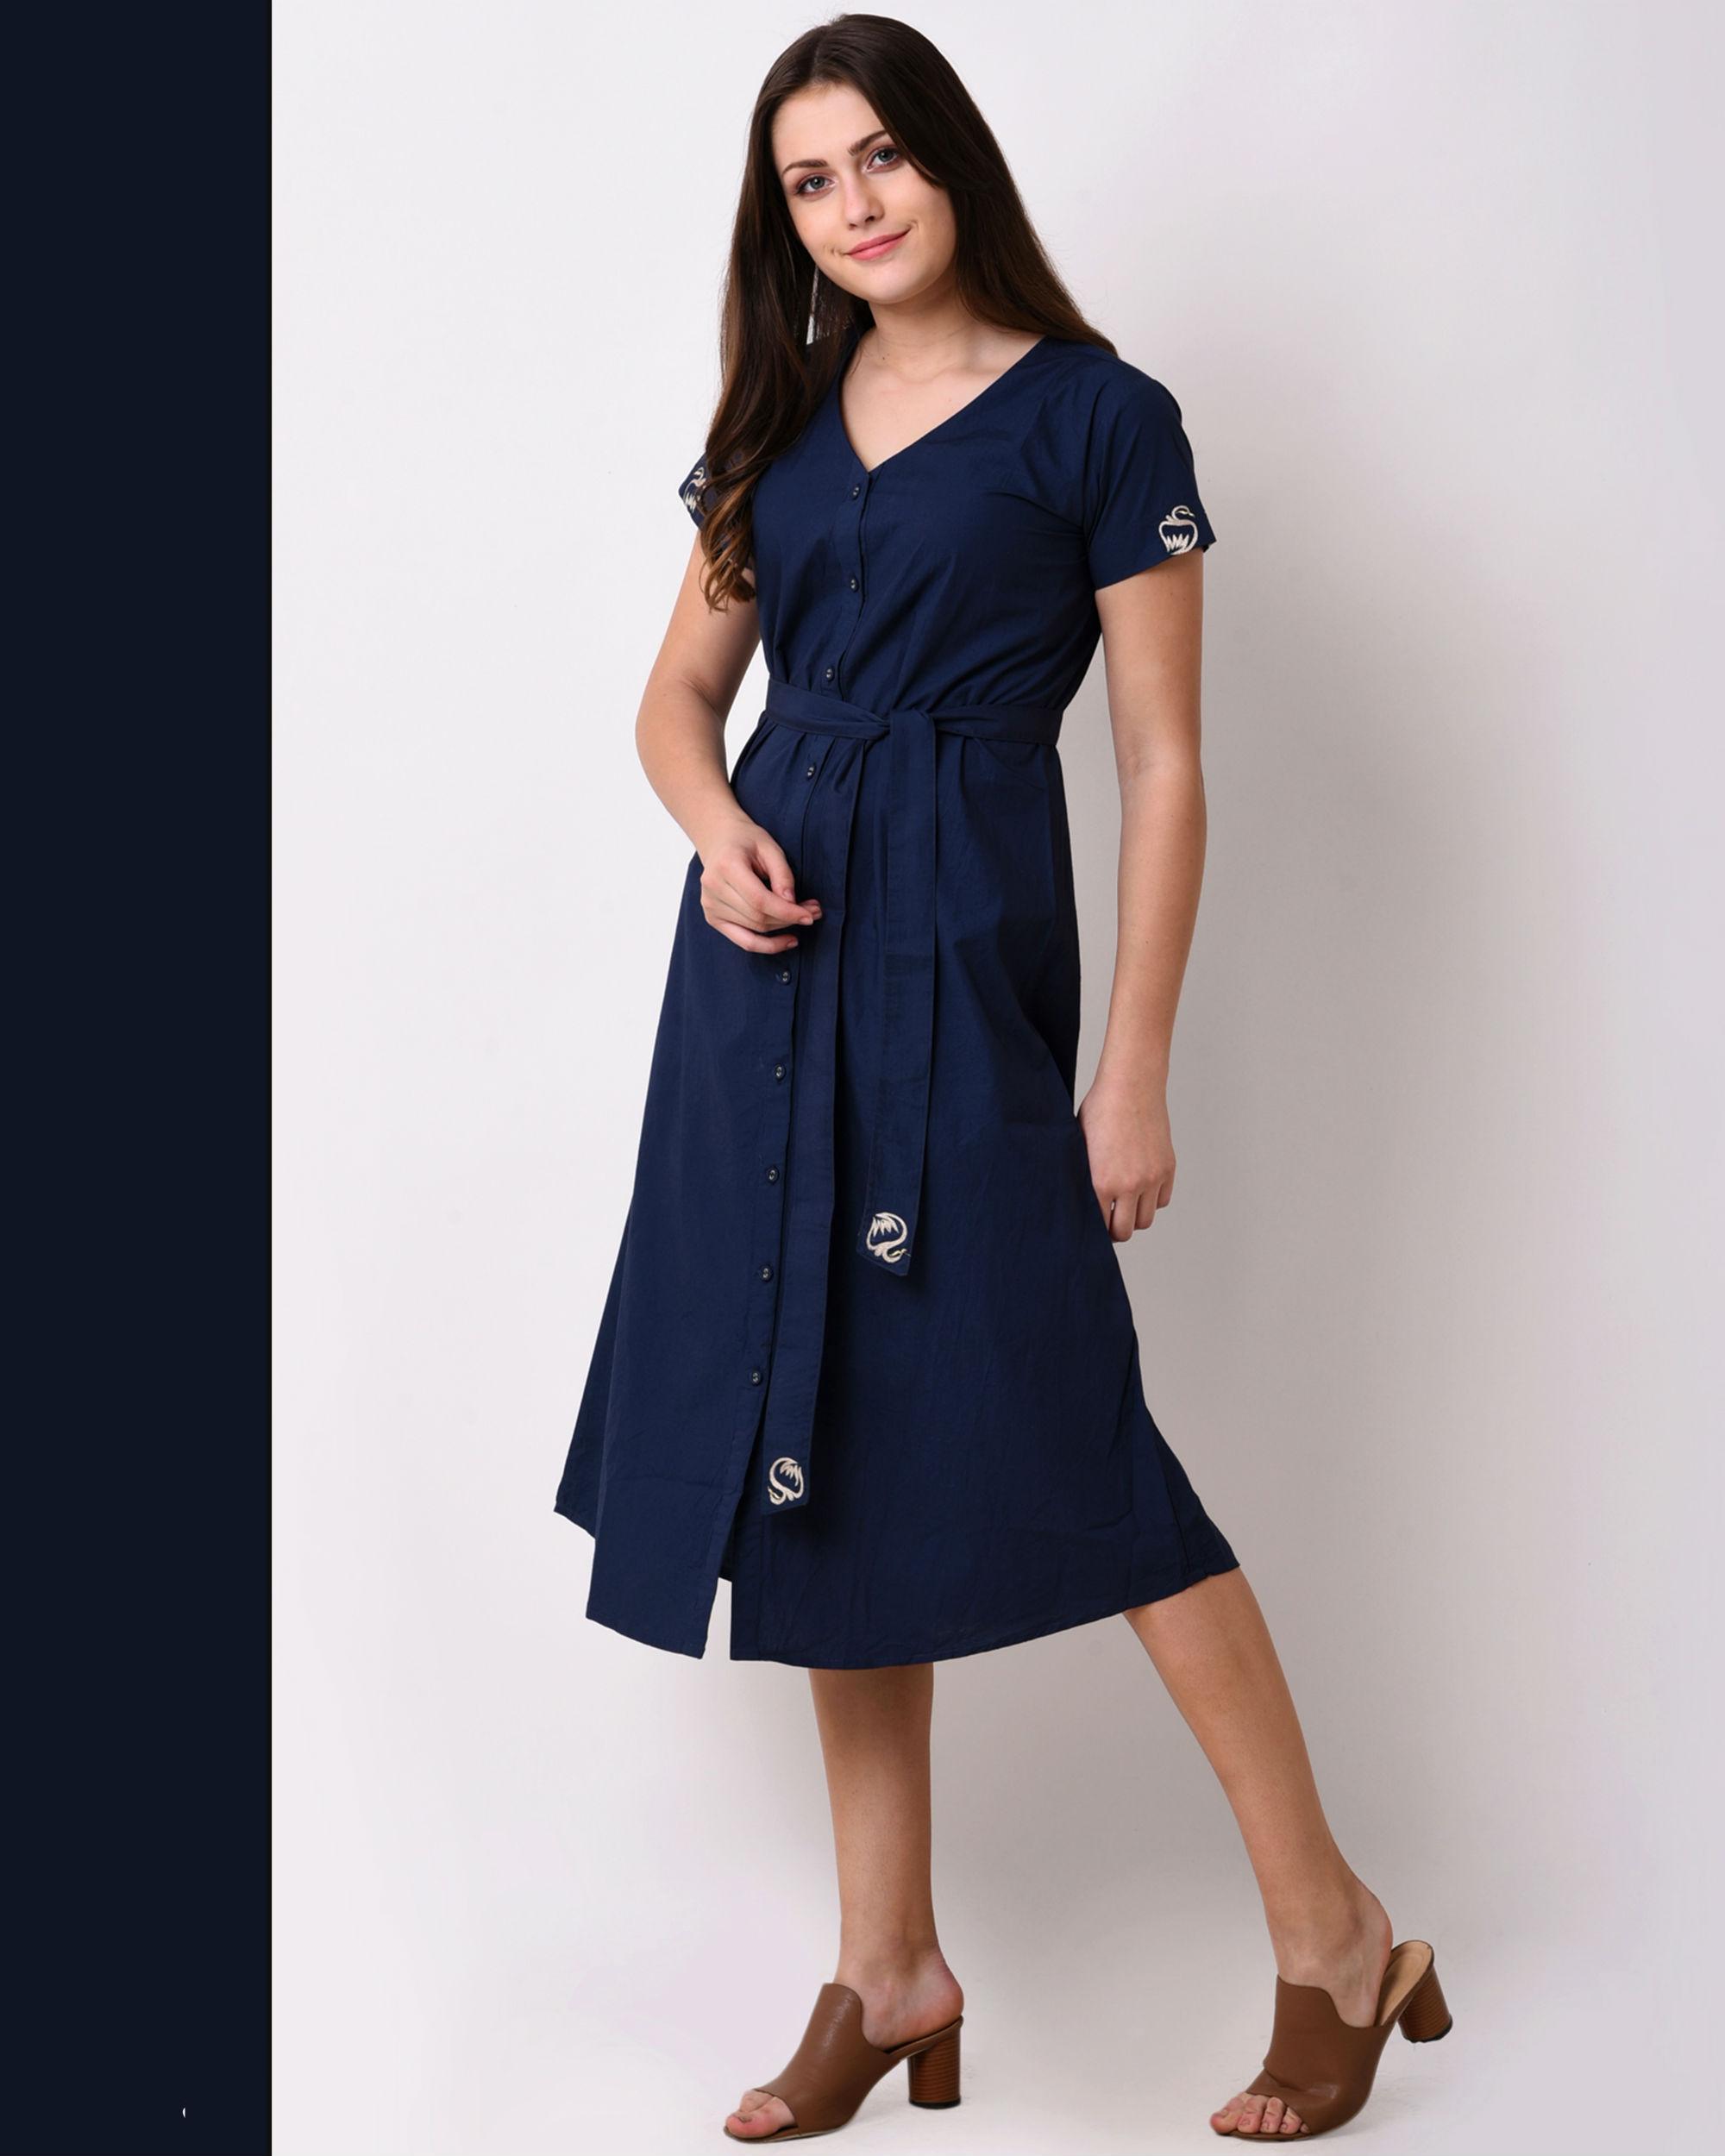 515e9f08c88 Navy blue embroidered shirt dress by Vritta